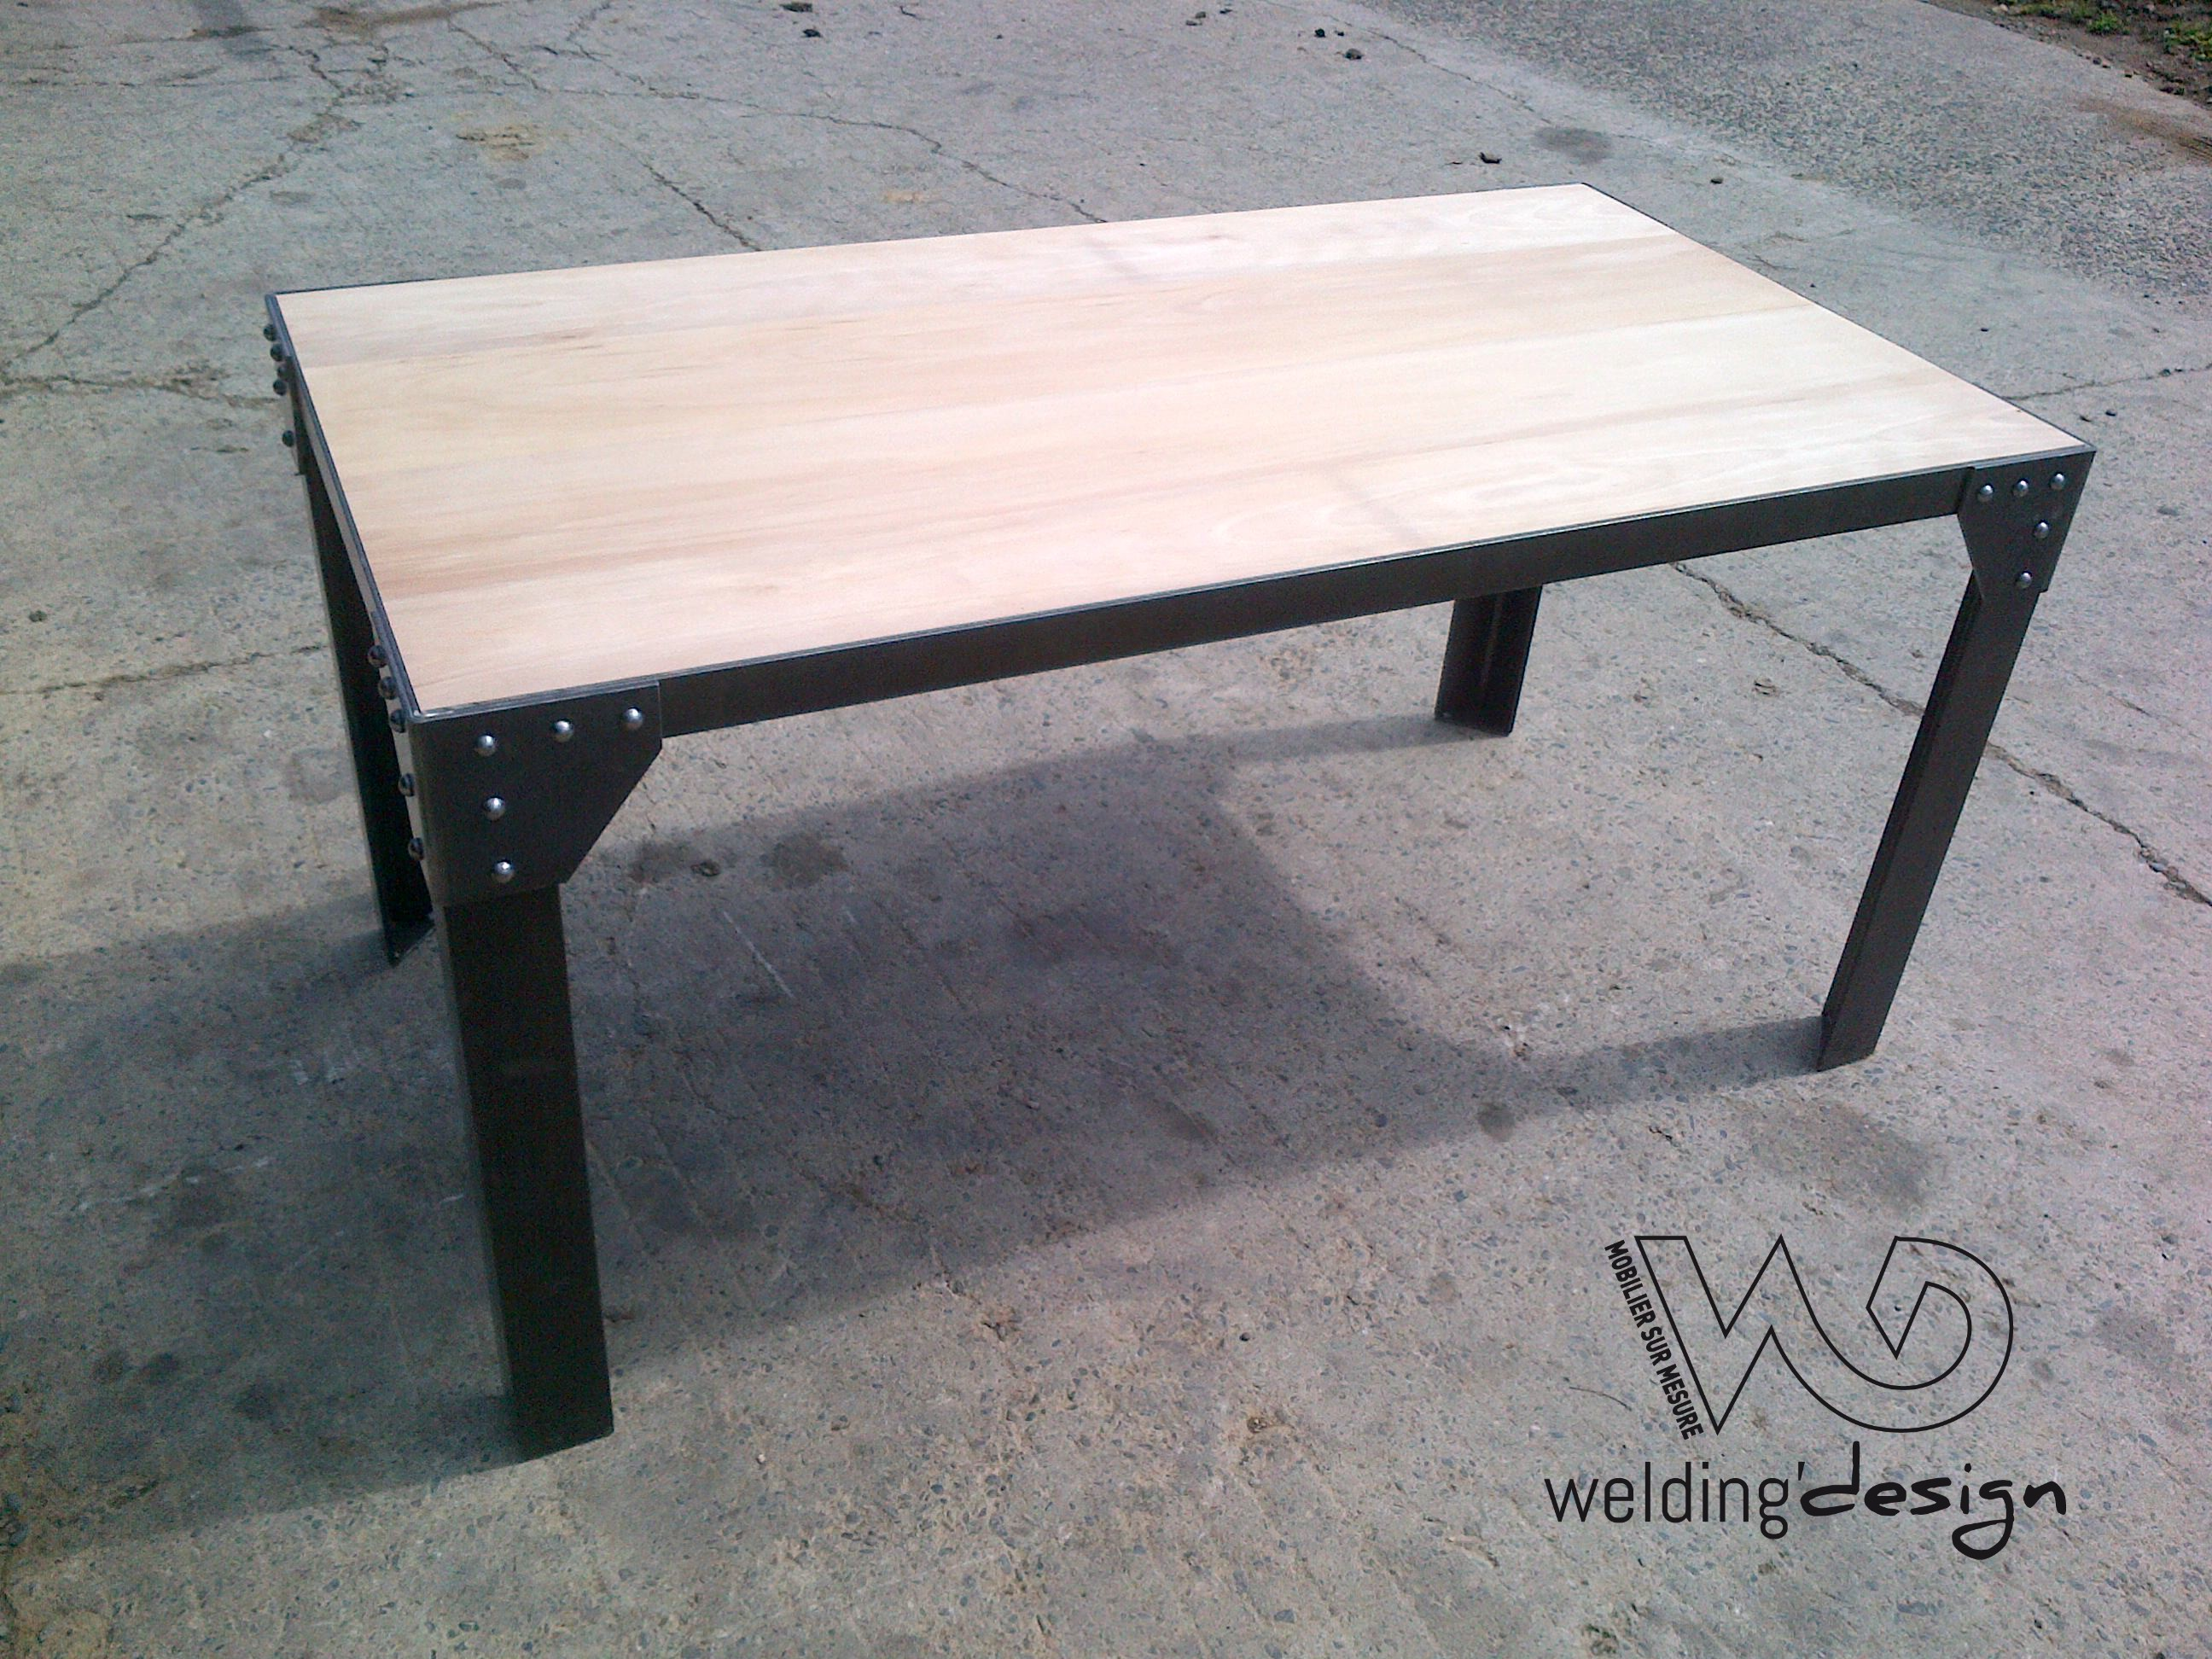 portfolio items archive page 10 sur 11 welding design. Black Bedroom Furniture Sets. Home Design Ideas